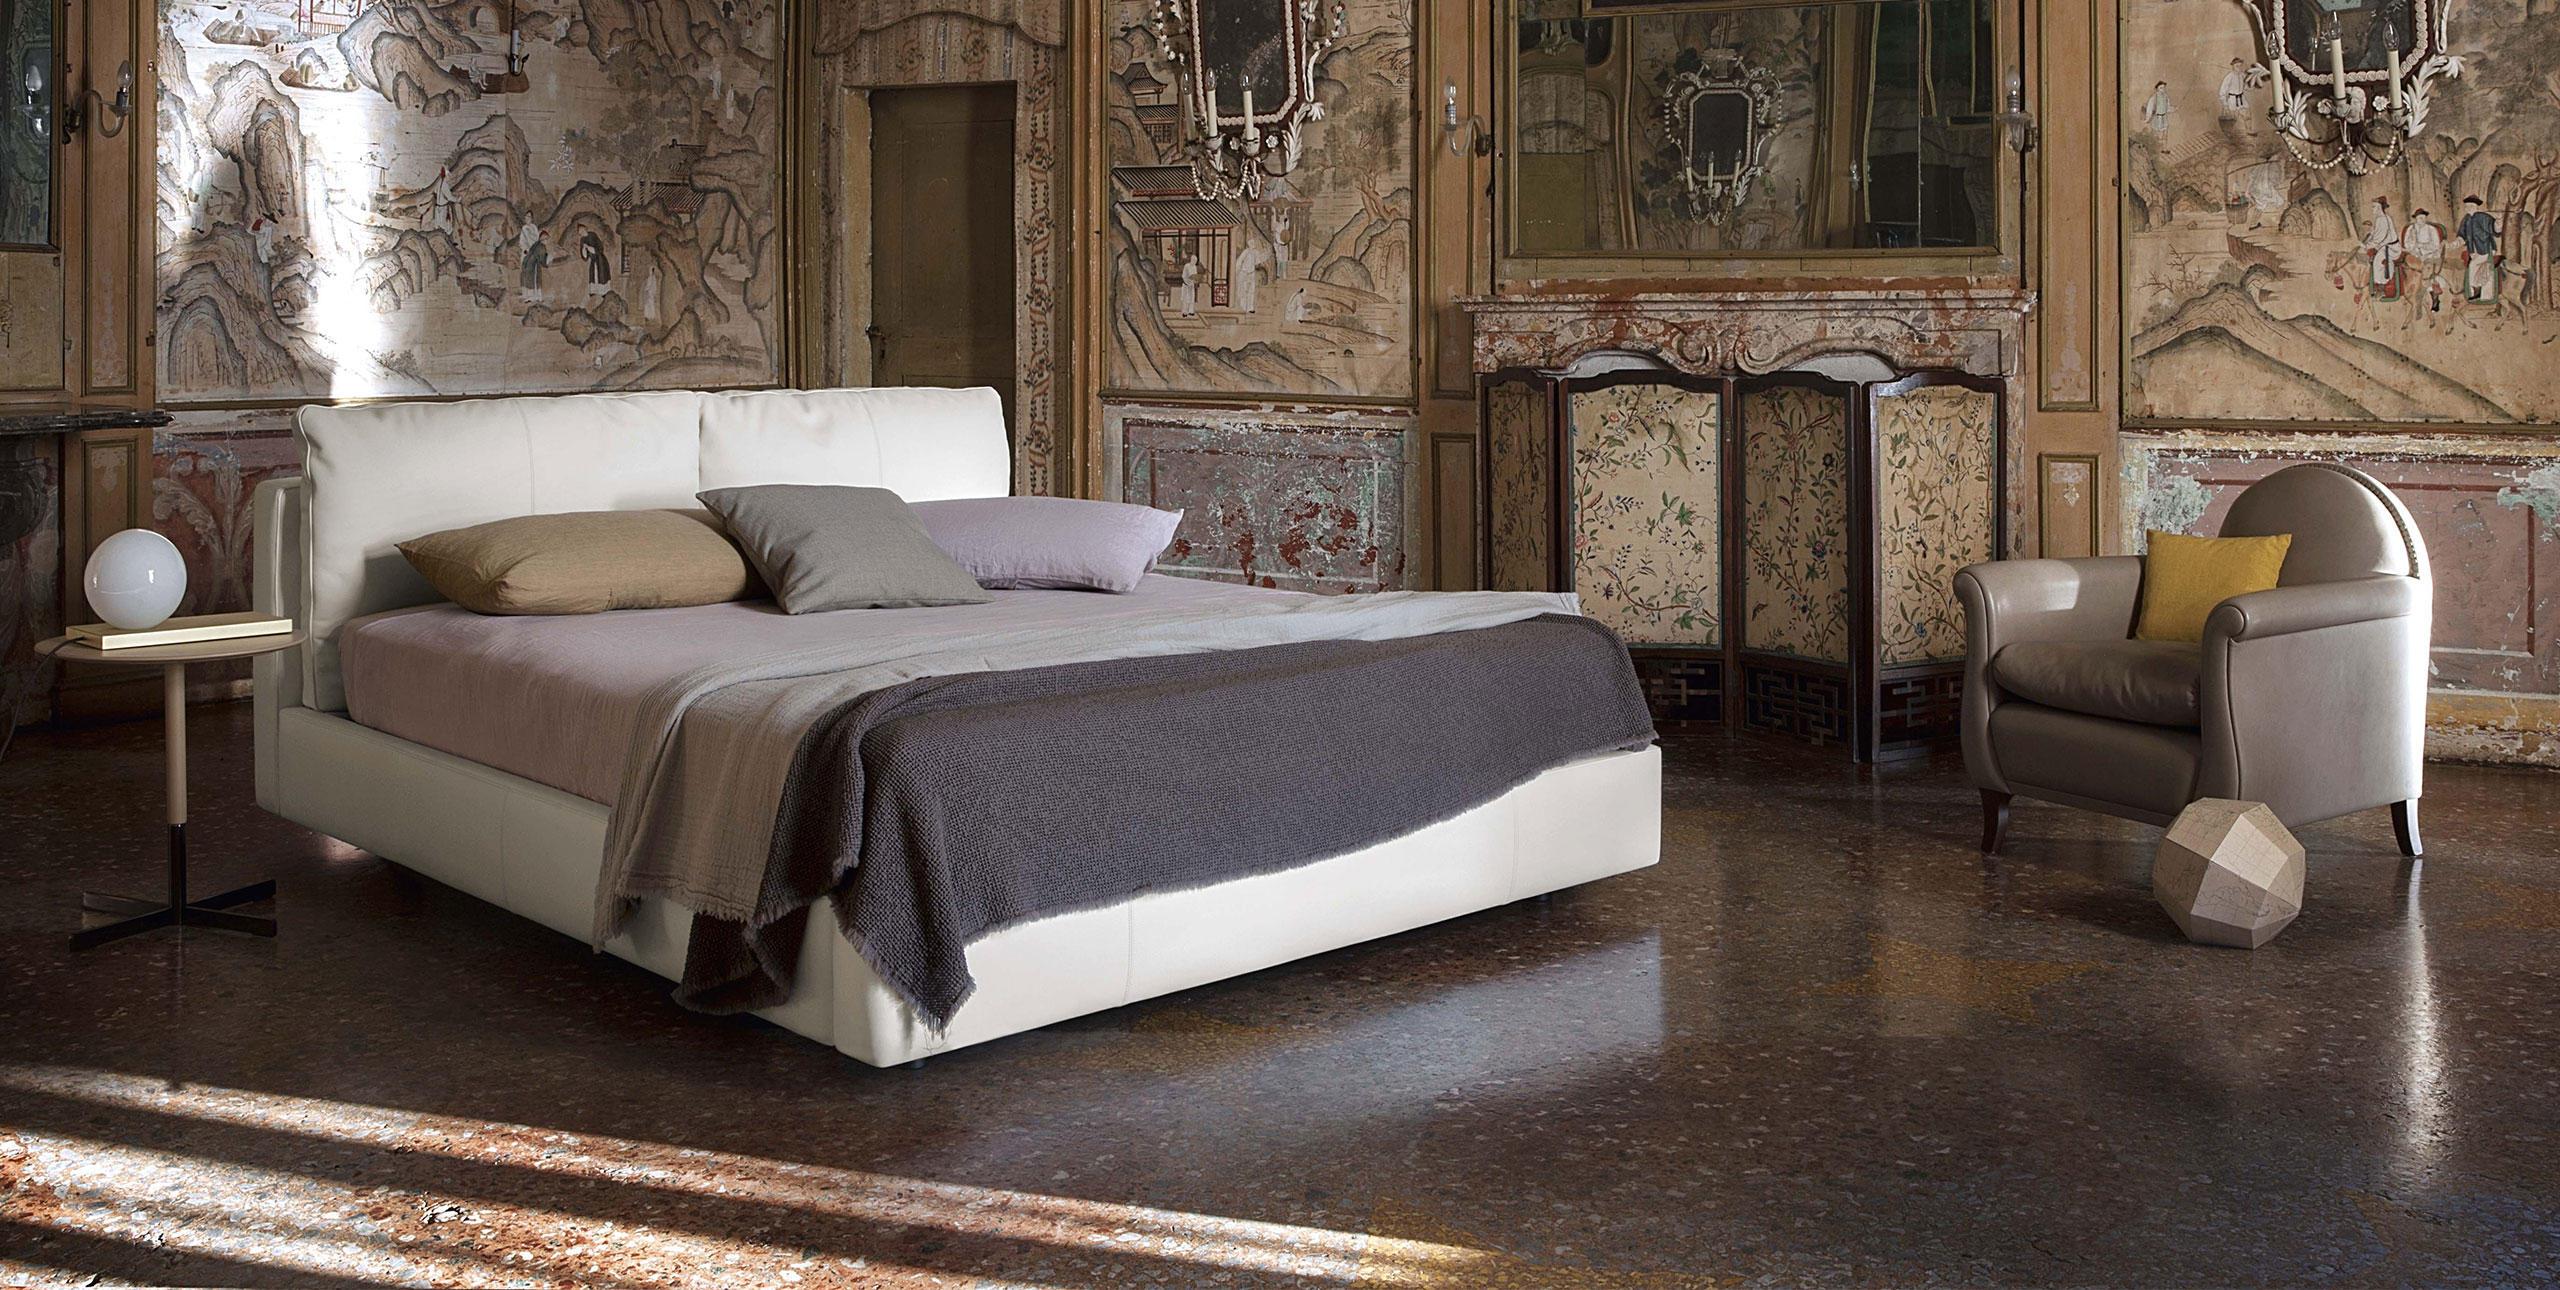 Letto Massimosistema Bed Poltrona Frau R. & D. - Arredamento & design